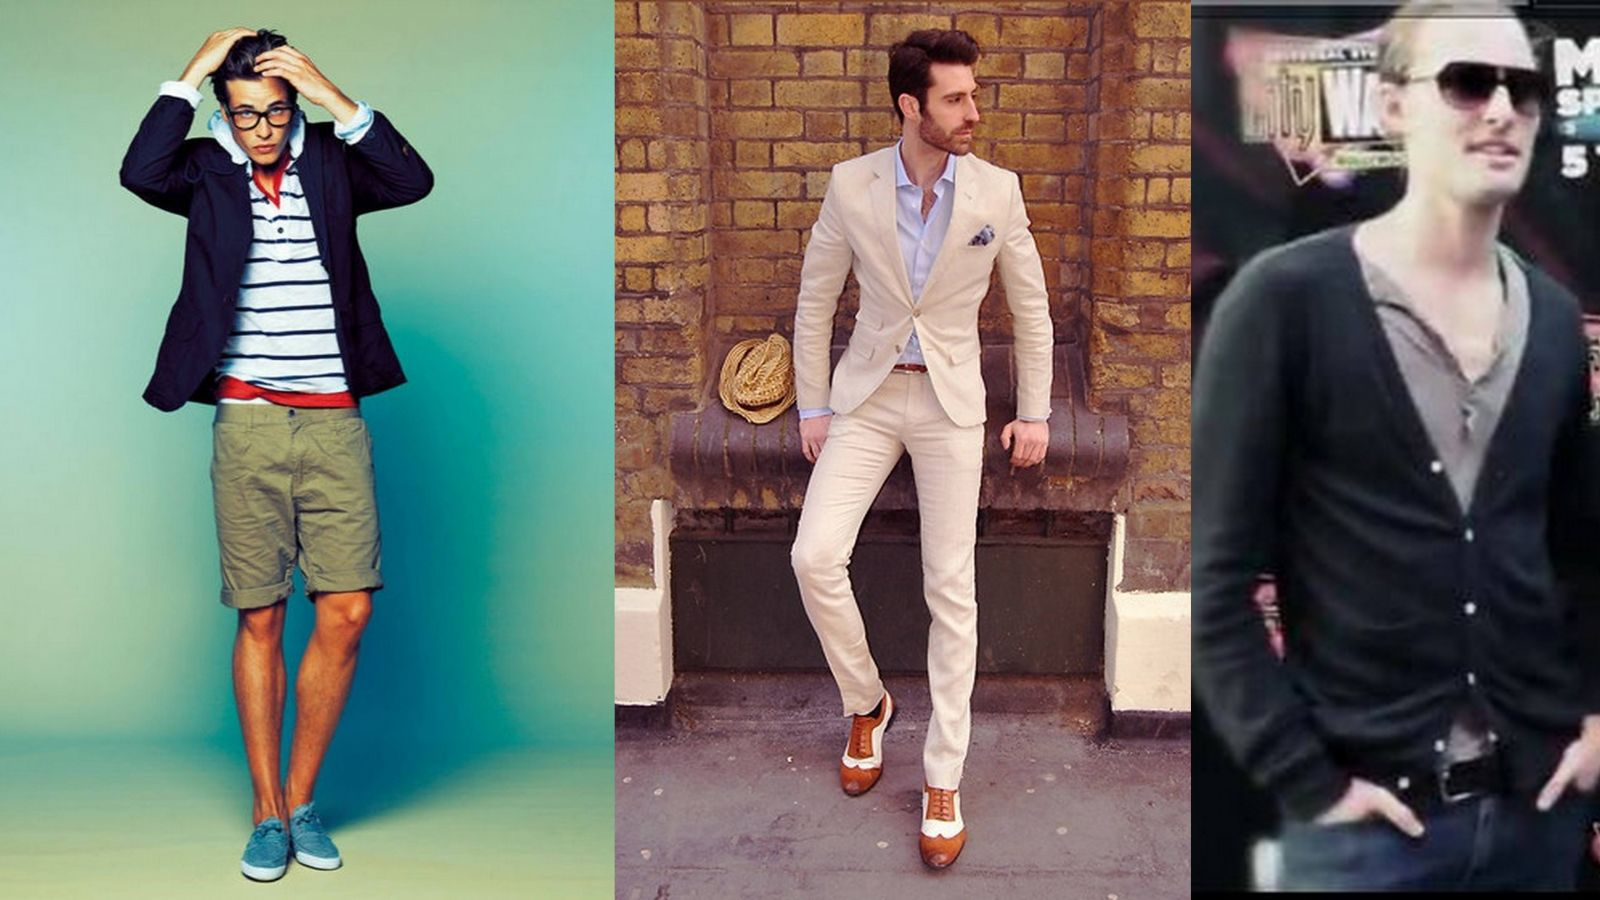 5 Trik Memilih Baju untuk si Pria Kurus, Bikin Tegap Berisi